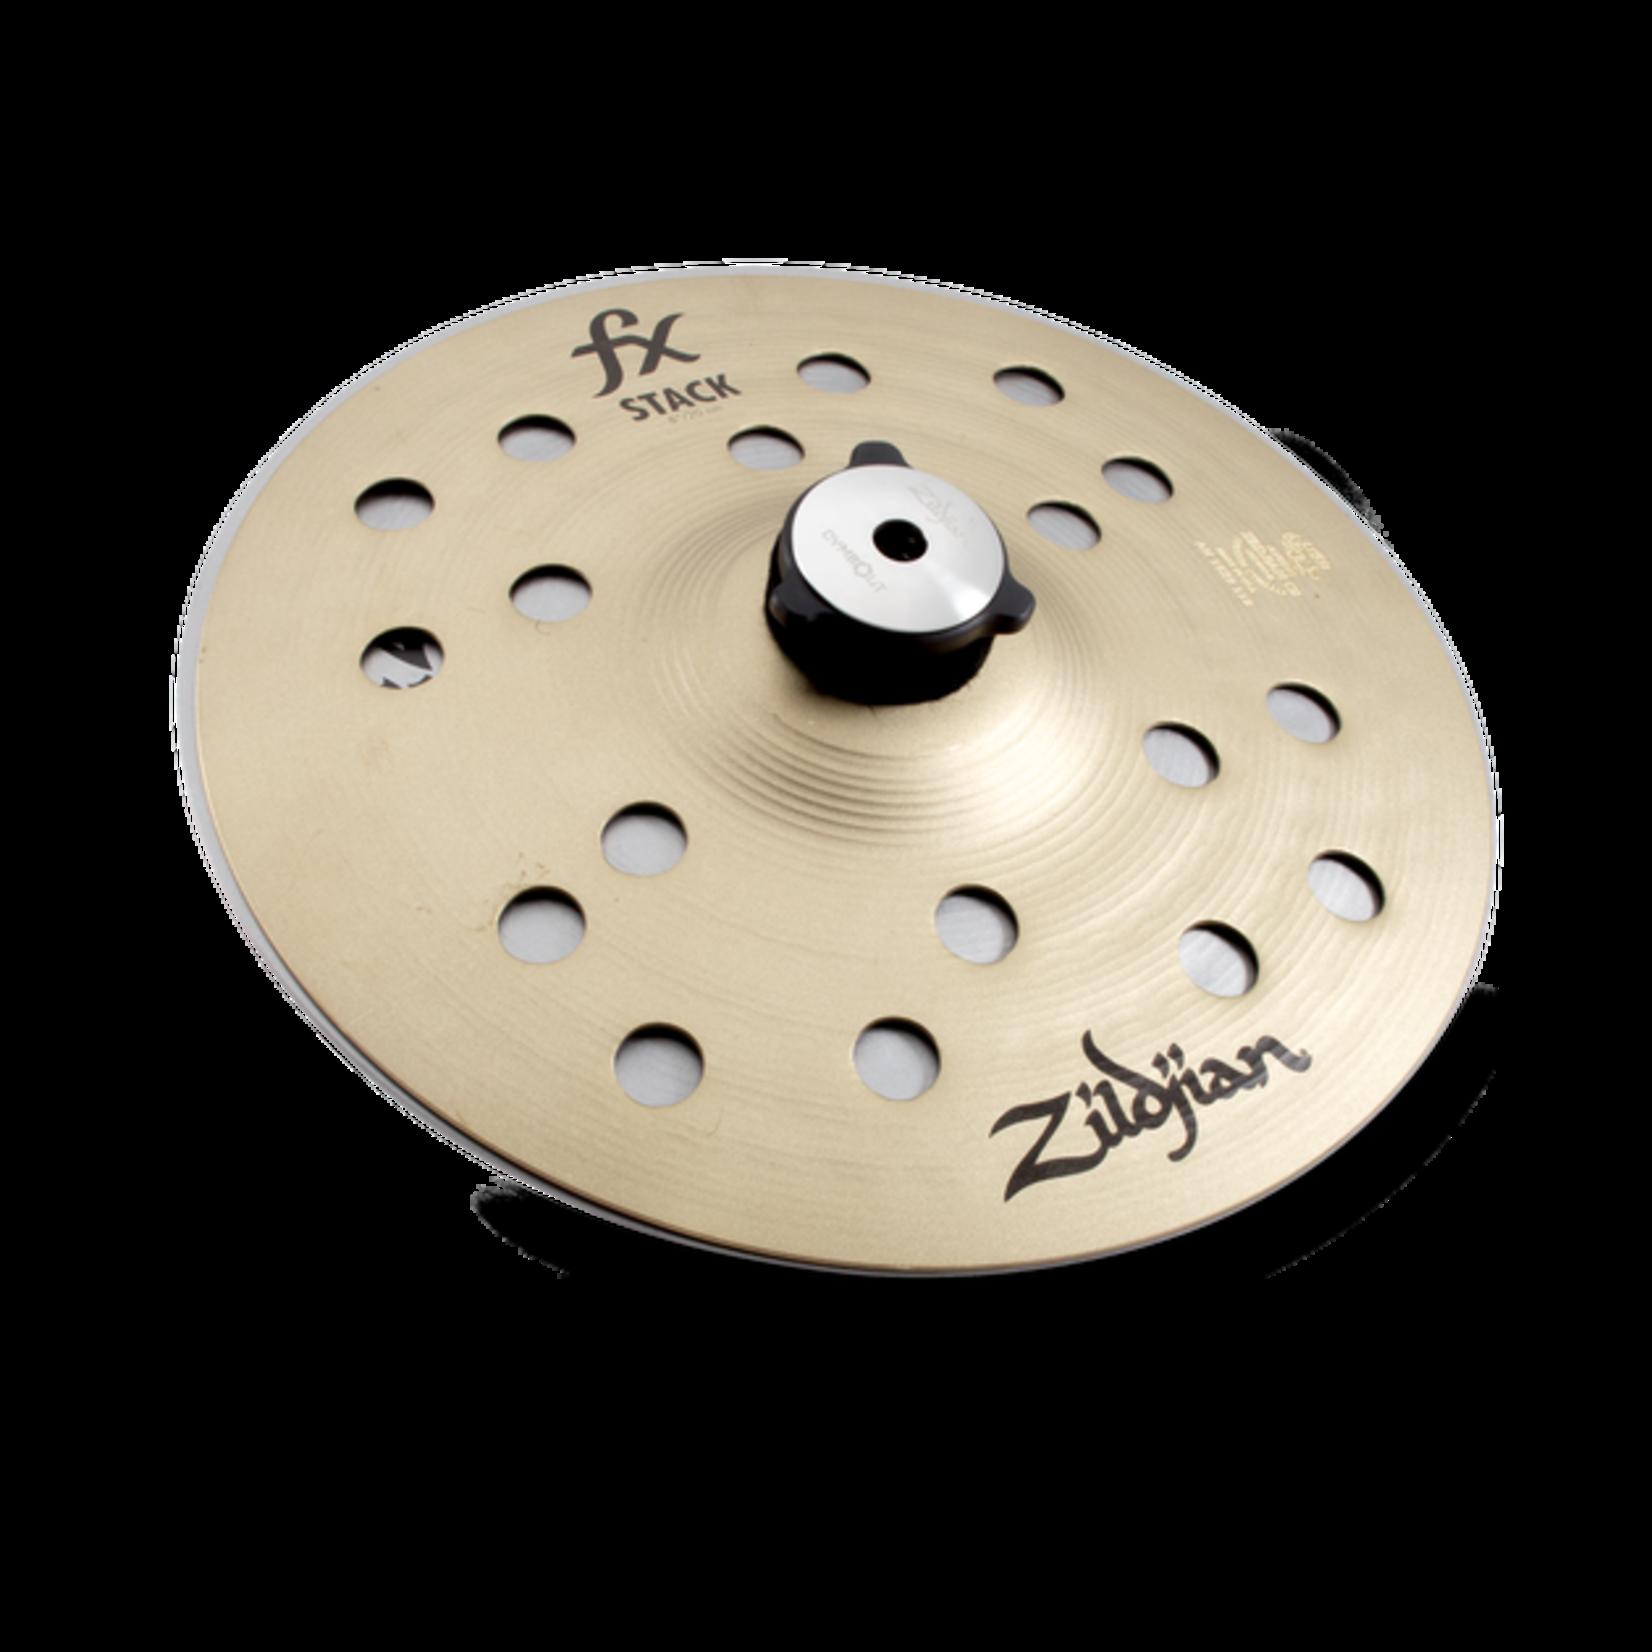 "Zildjian Zildjian 14"" FX Stack Pair w/Mount"